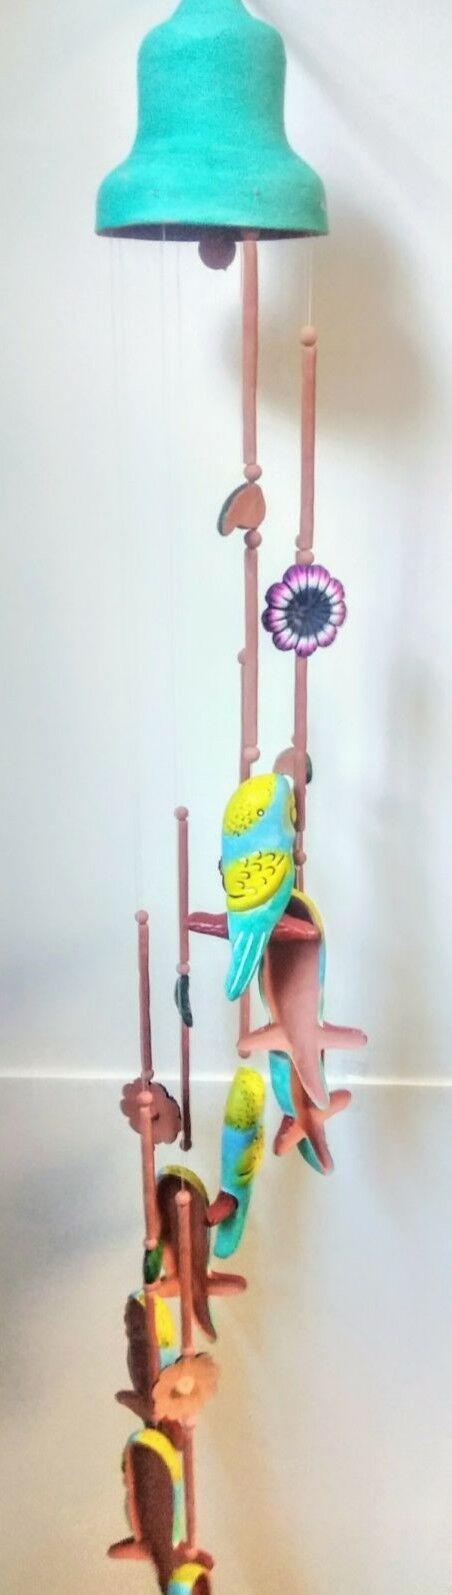 Handmade Wind Chime Decoration